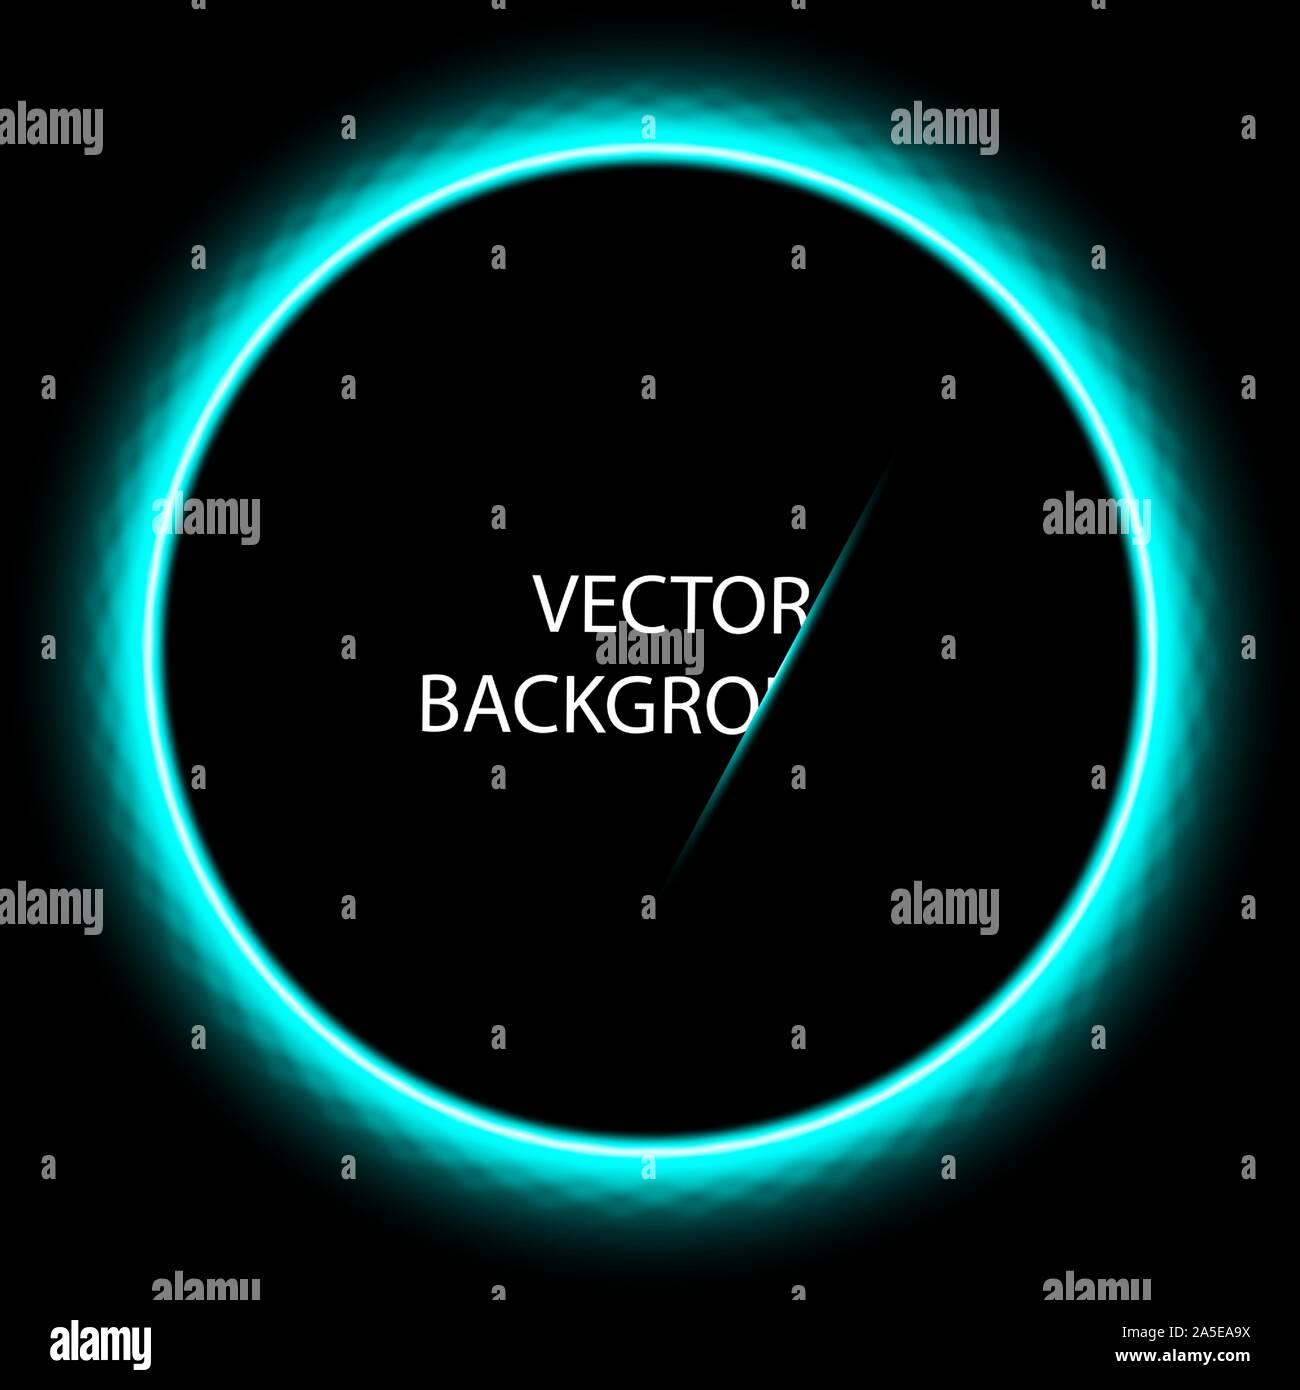 Dark dark blue abstract circle technologie contexte vecteur conception eps 10. Illustration de Vecteur